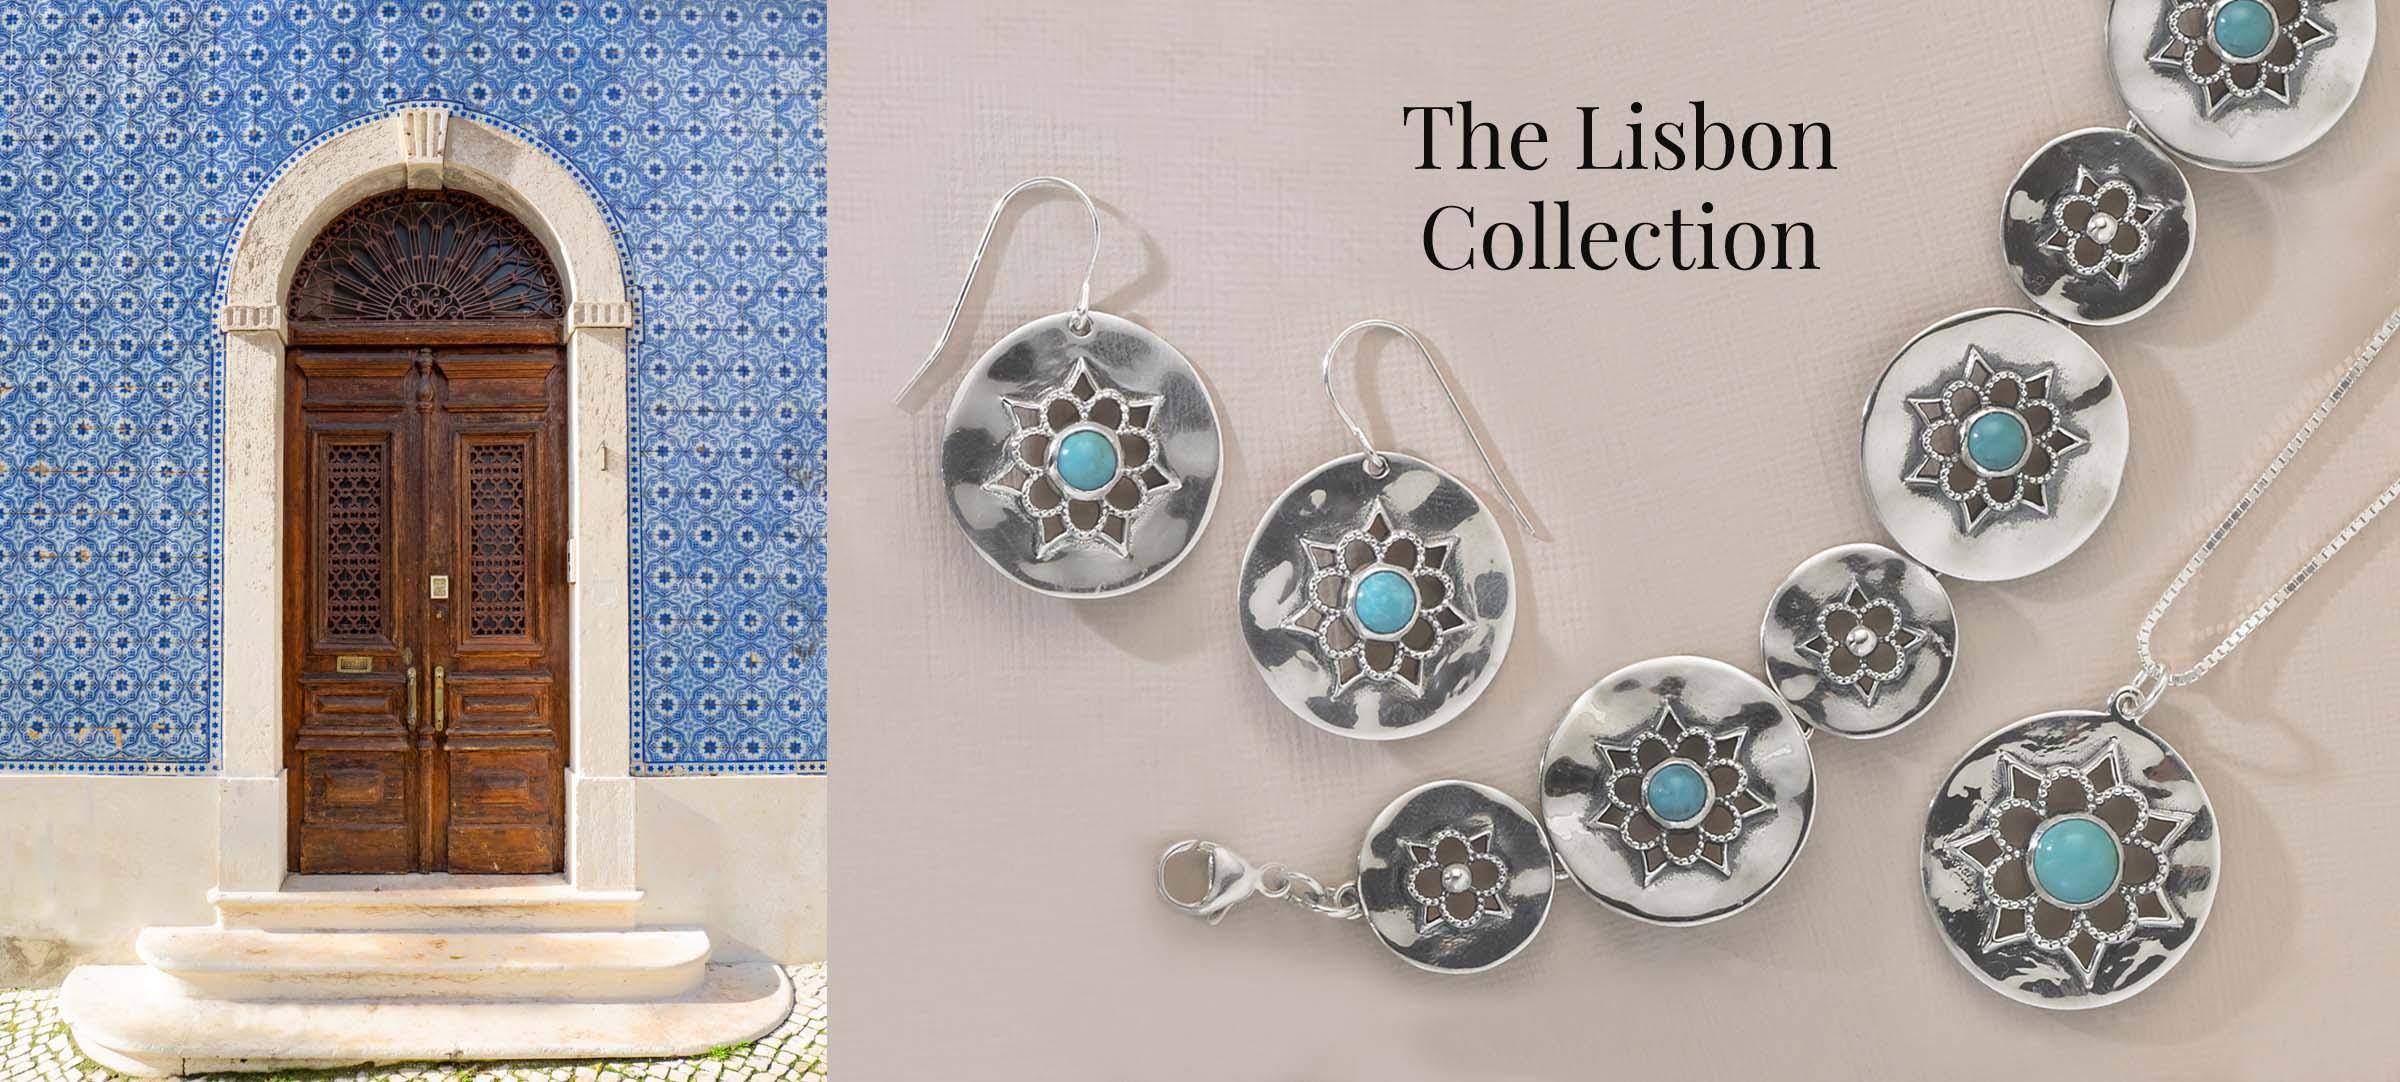 lisbon-collection-2.jpg